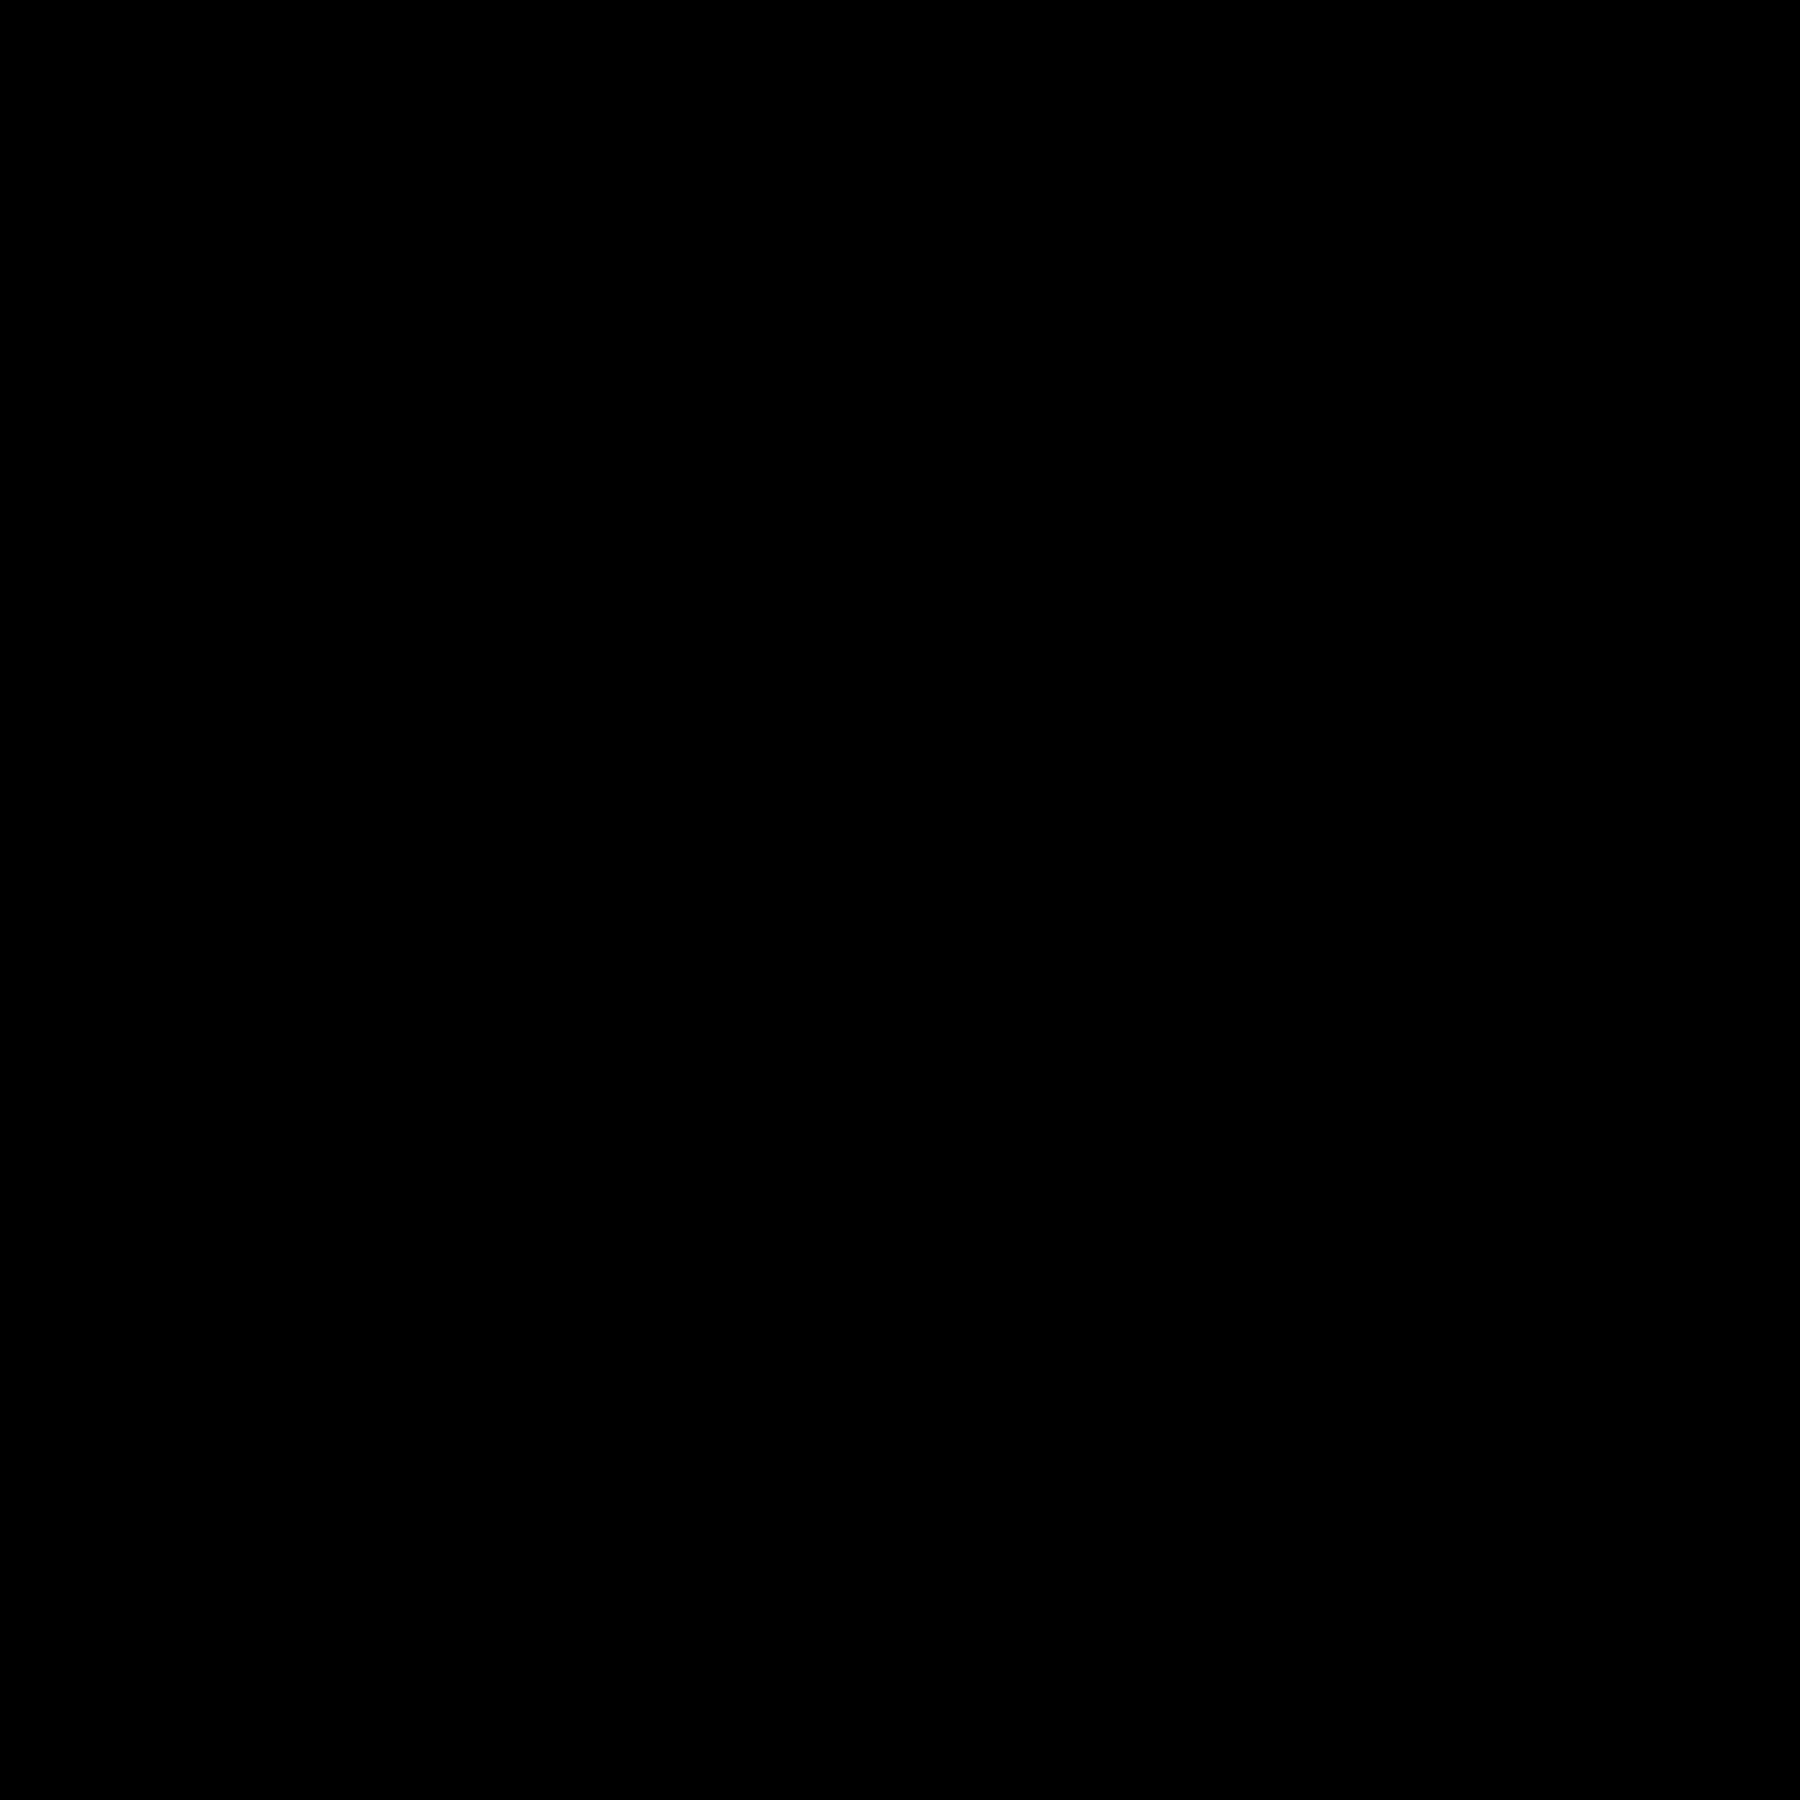 Educational Rockstar SVG Cut File